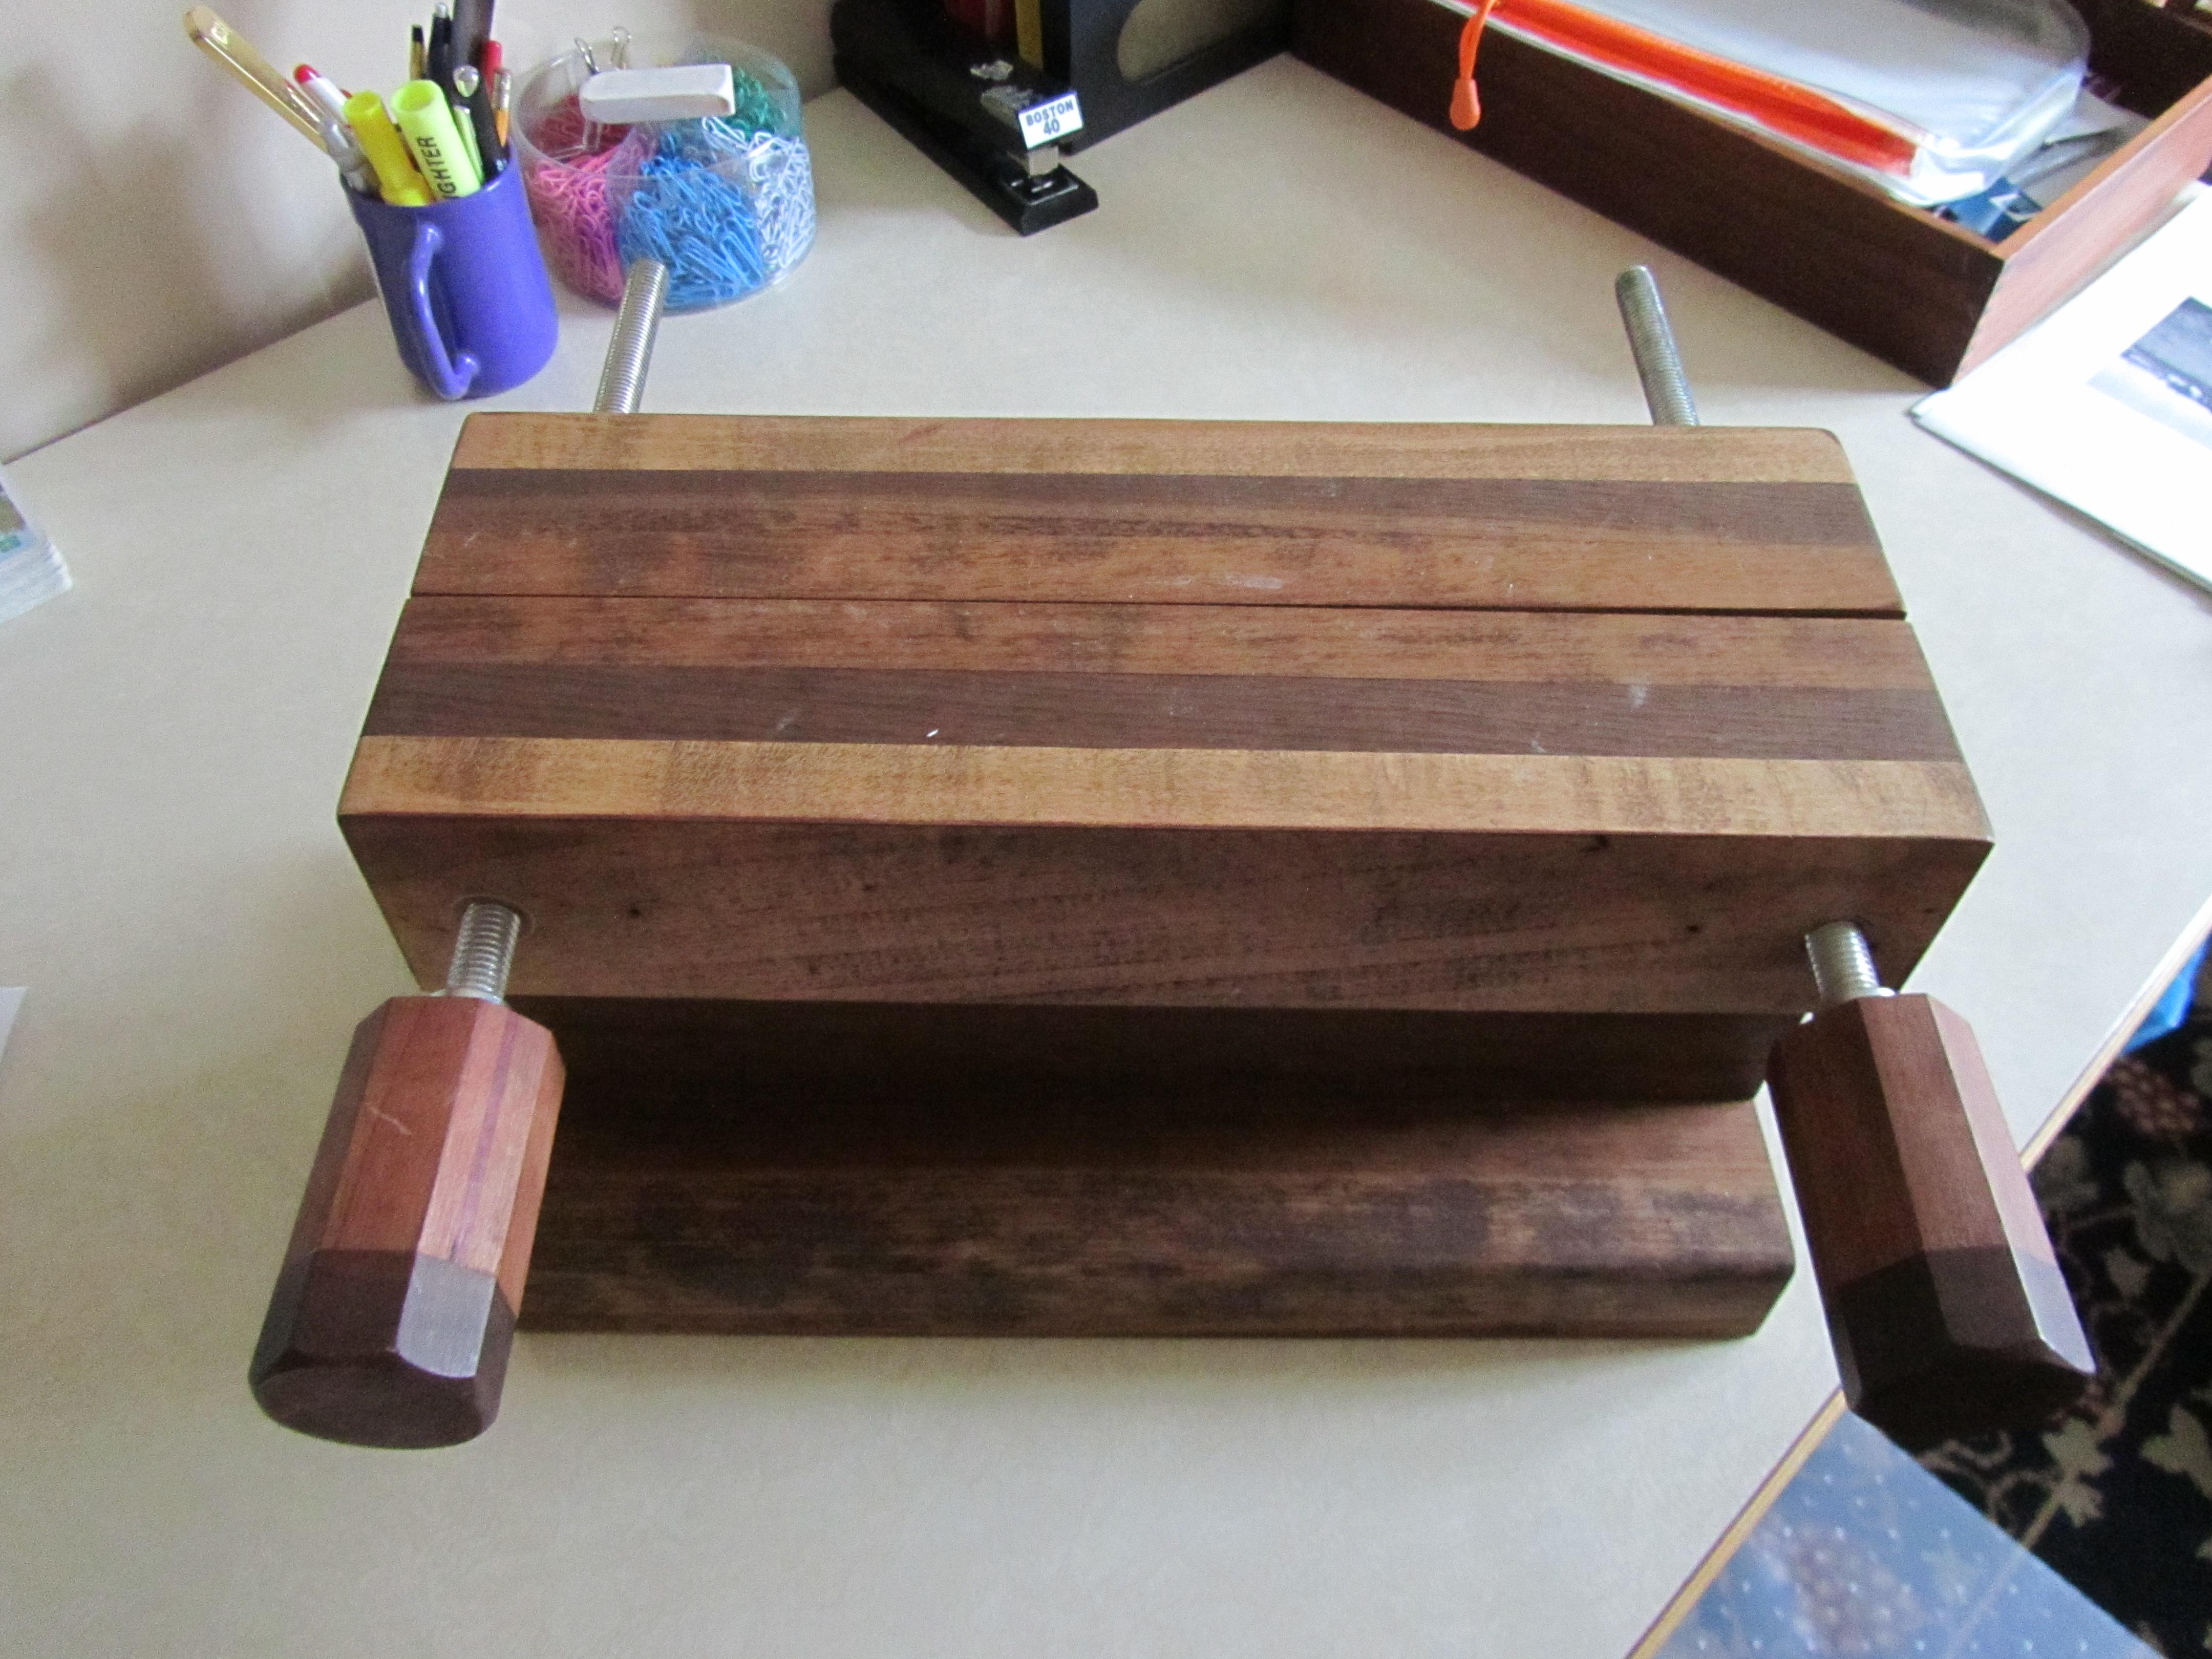 Book binding tool for Barb